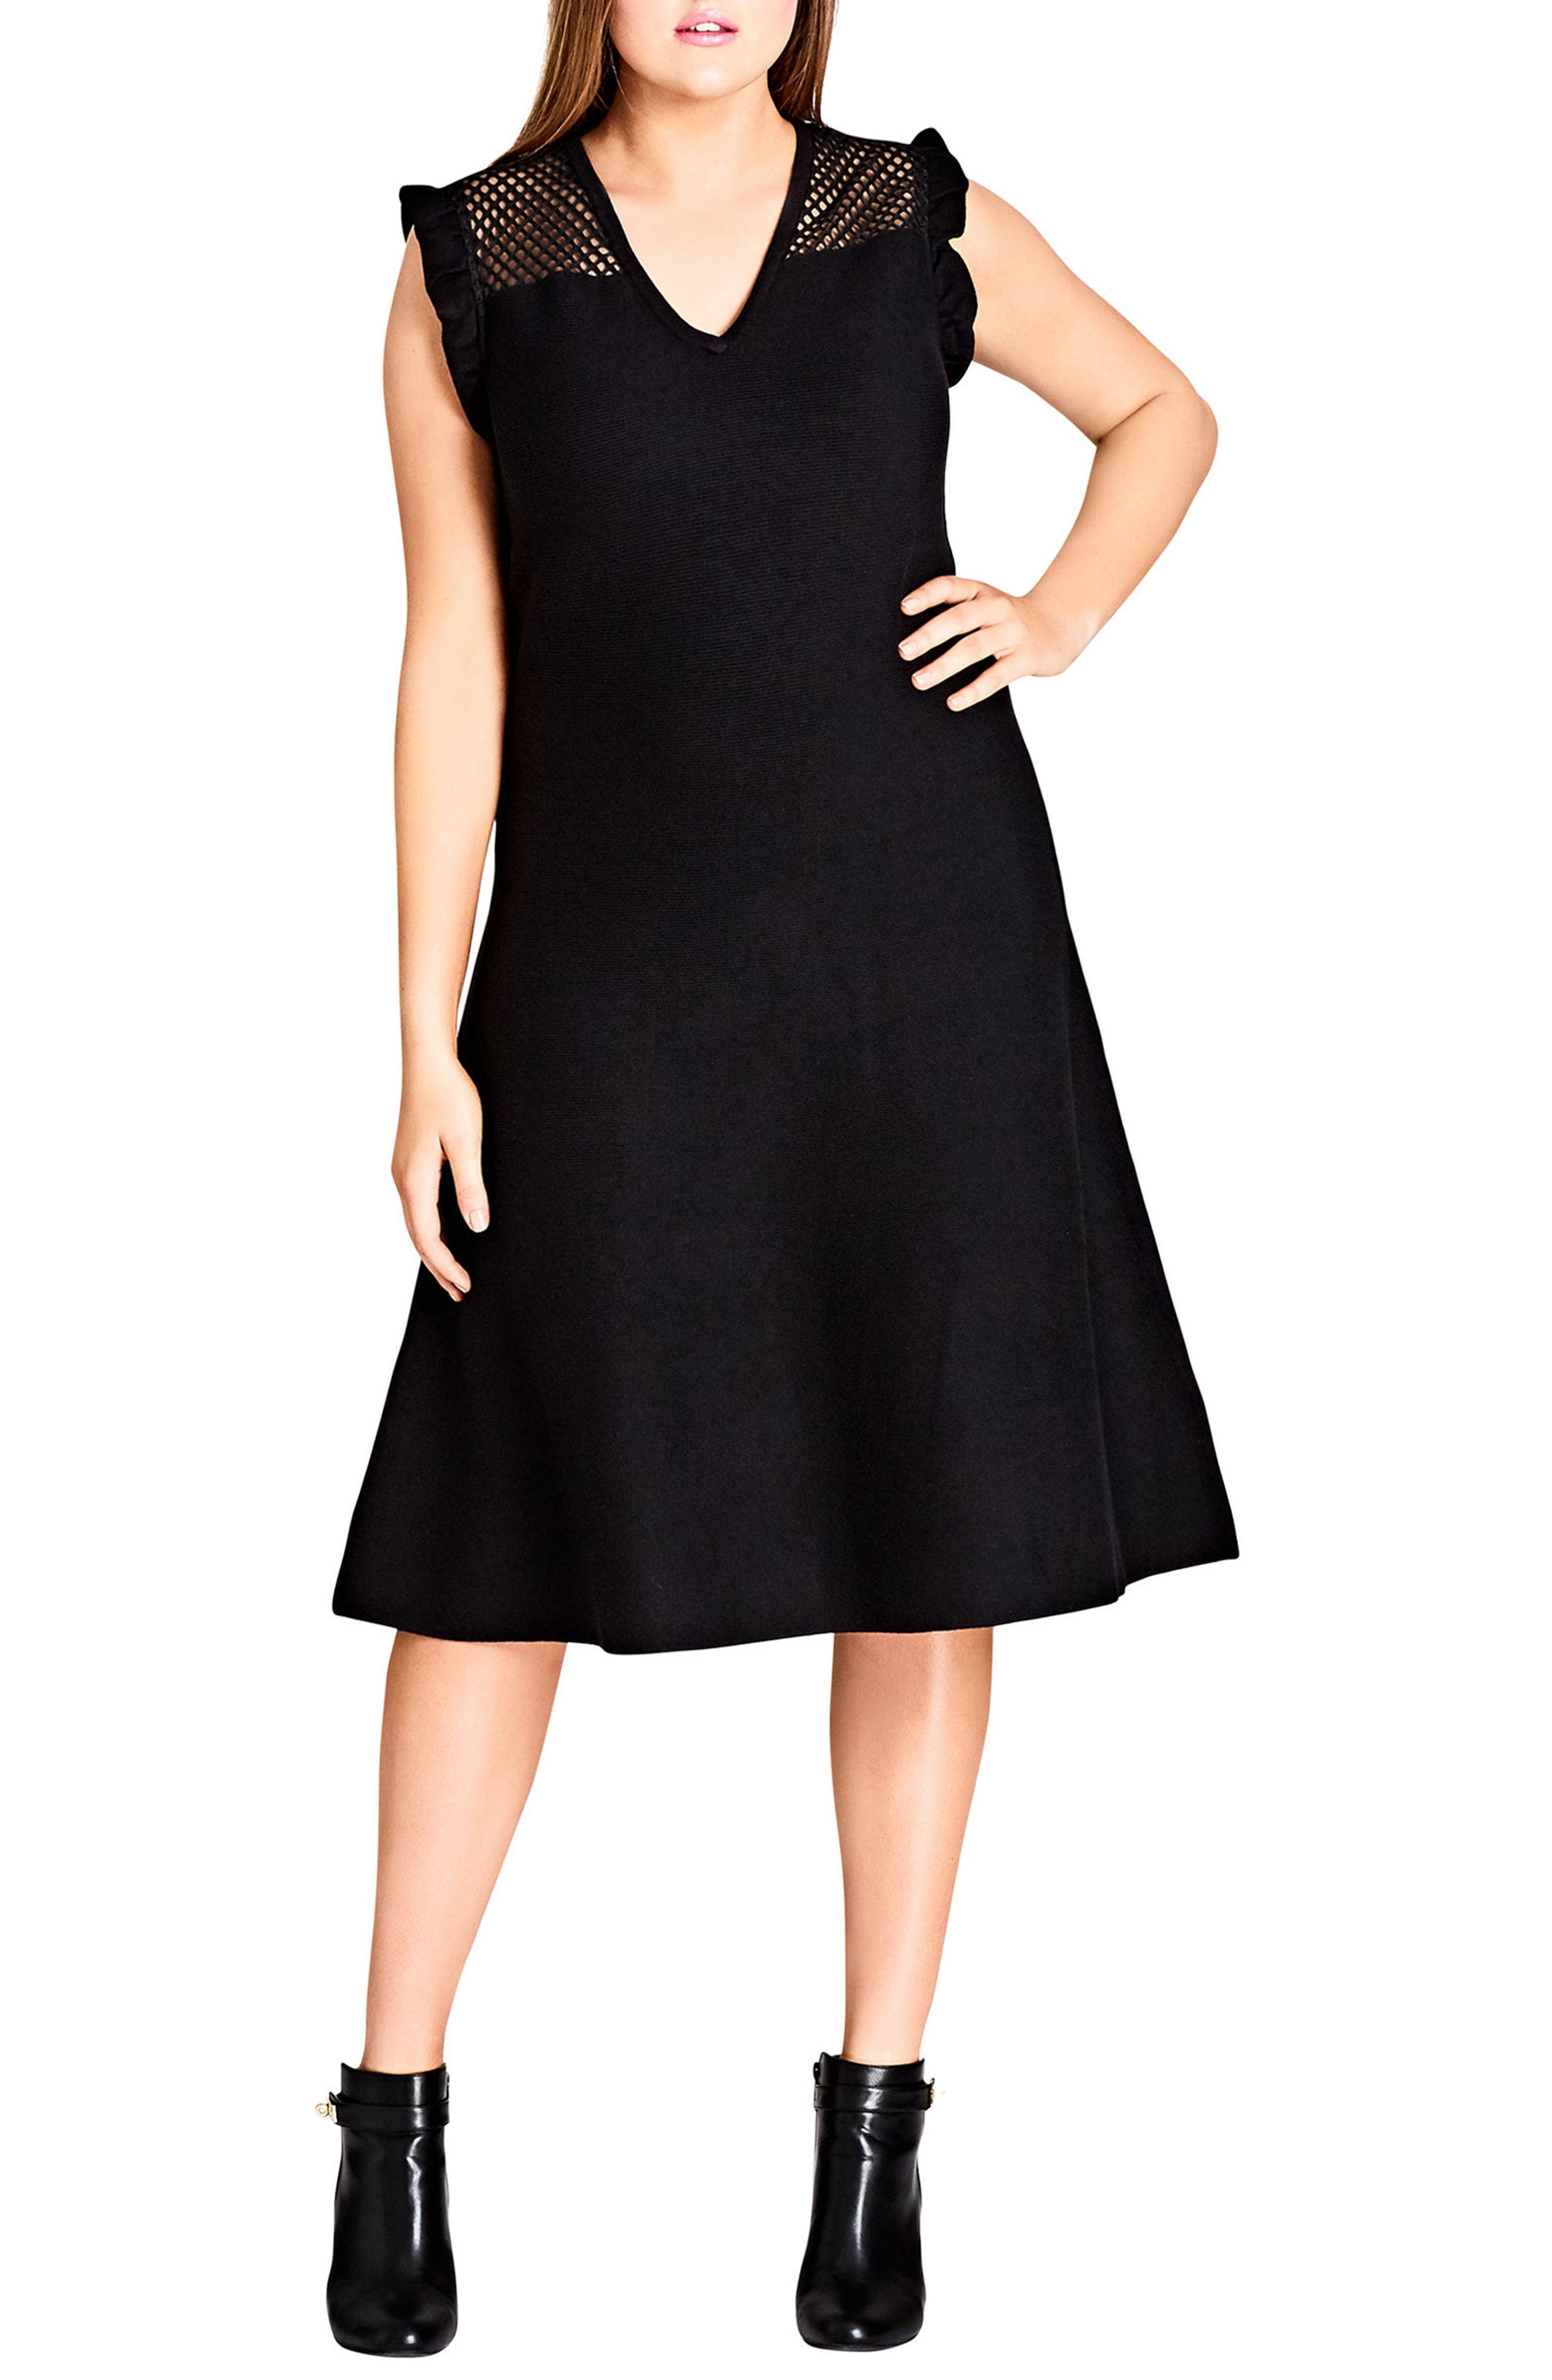 c5e39889621b Lyst - City Chic Charmer Fit   Flare Midi Dress in Black